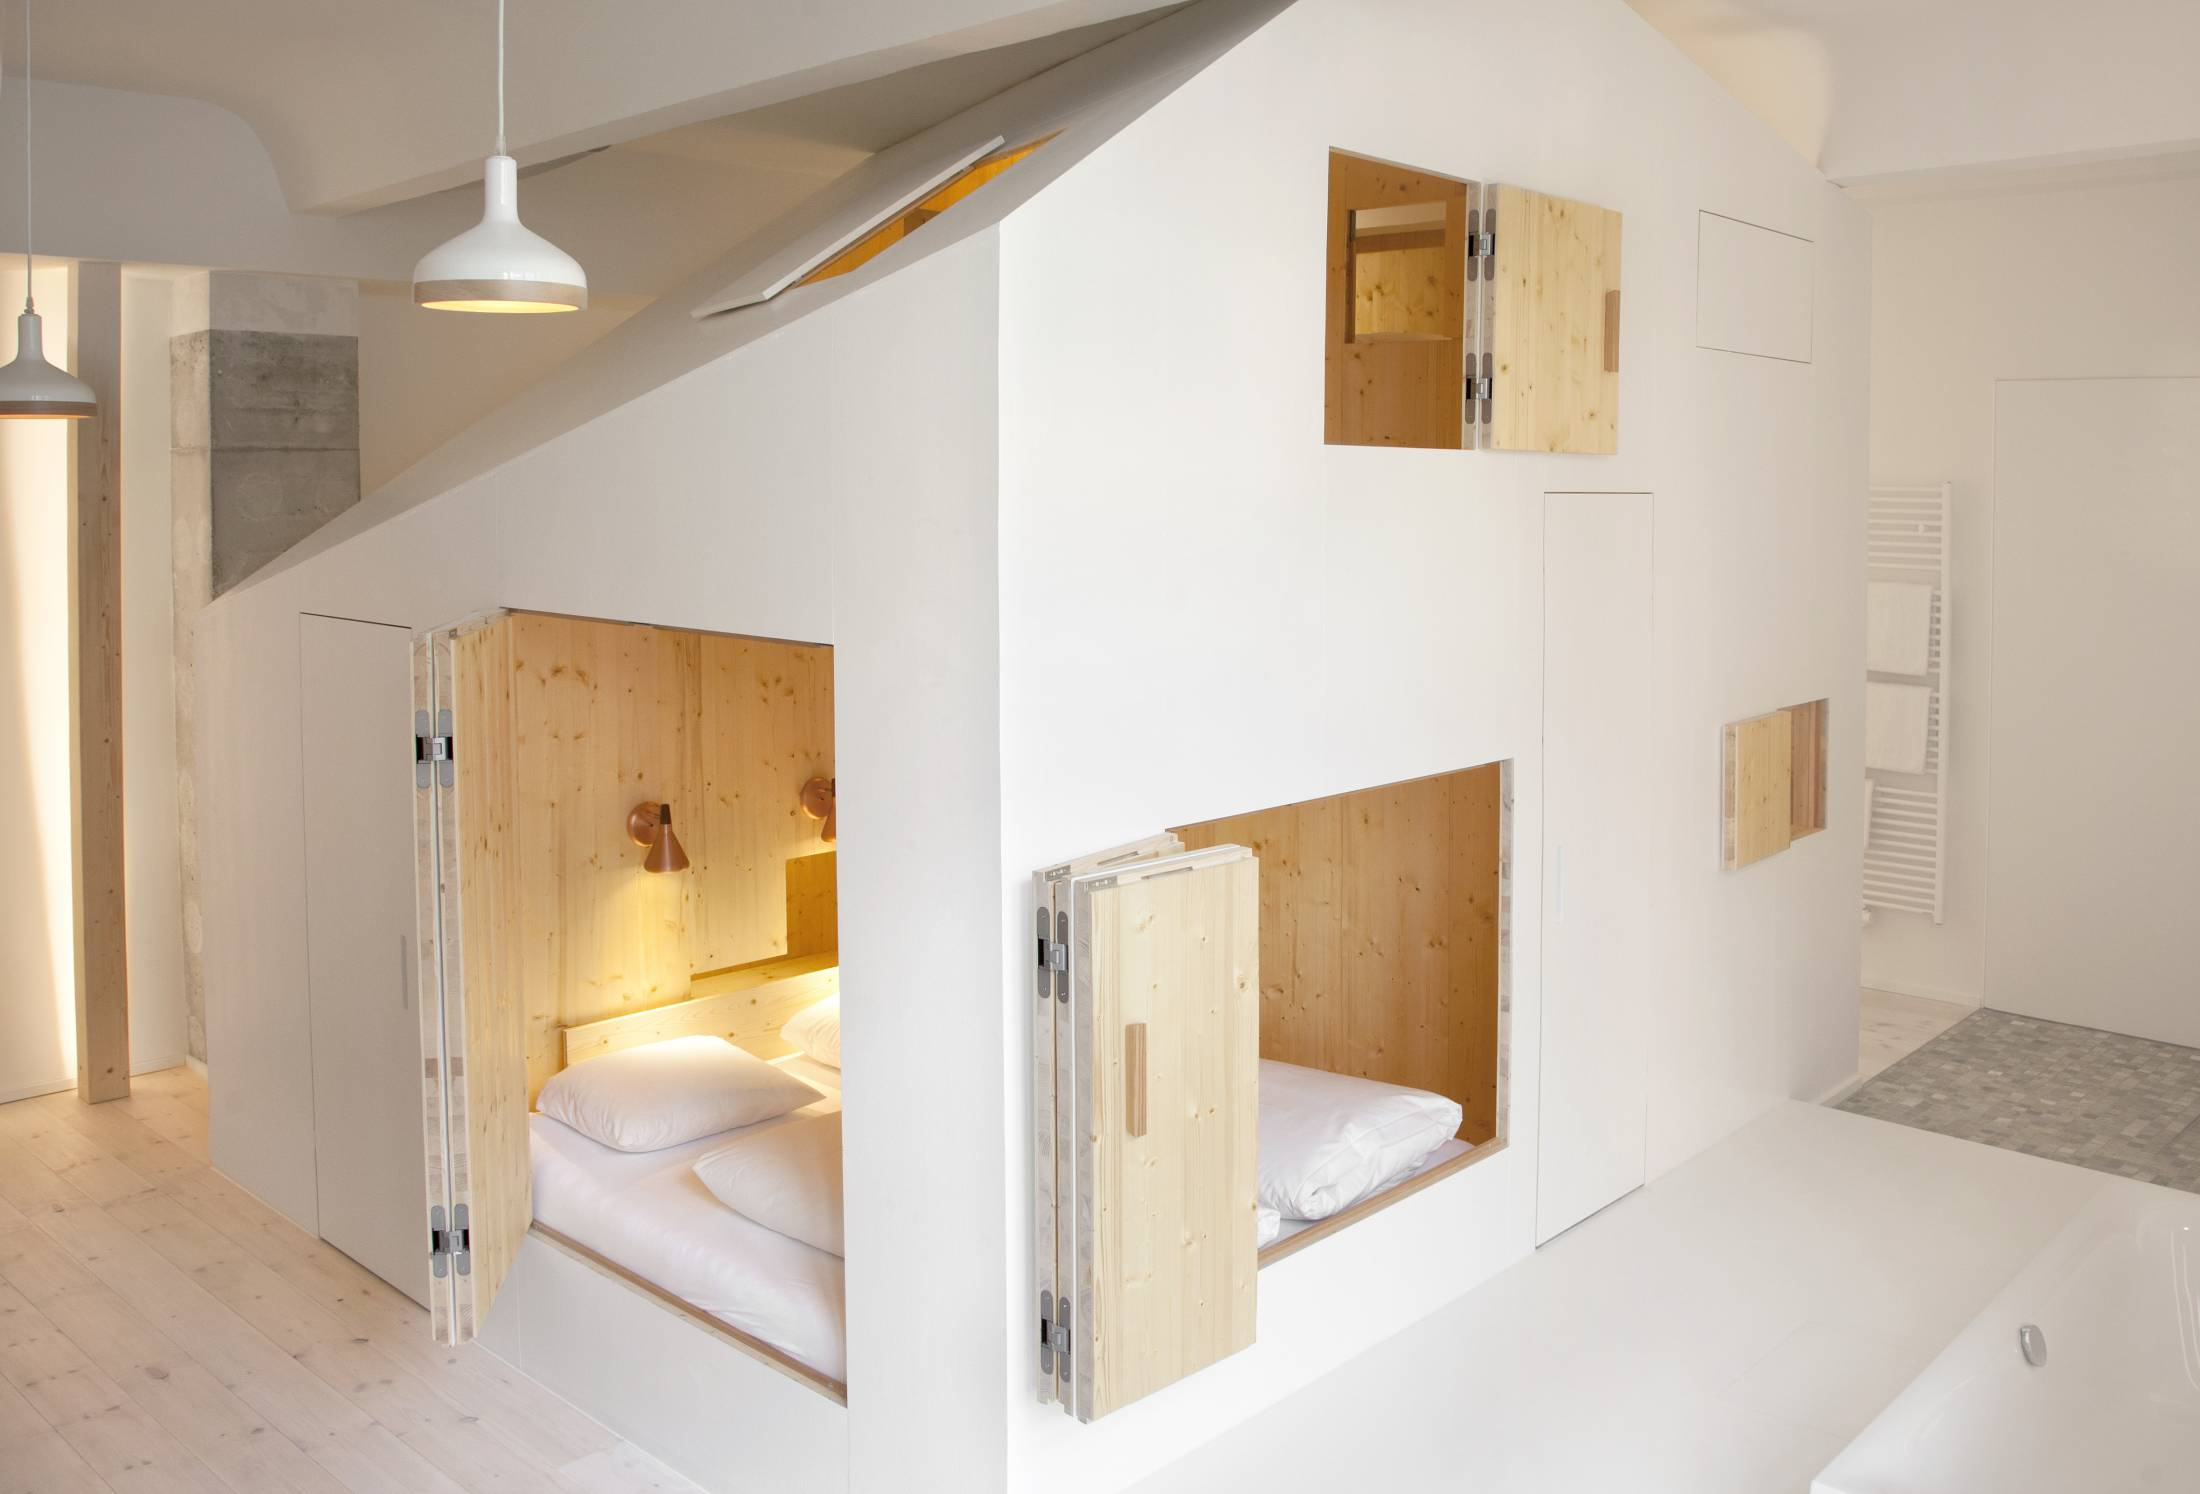 Room-304_Sigurd-Larsen_Michelberger-Hotel_Architecture-Danish-design-berlin_photo-Rita-Lino-3-1100x747@2x.jpg